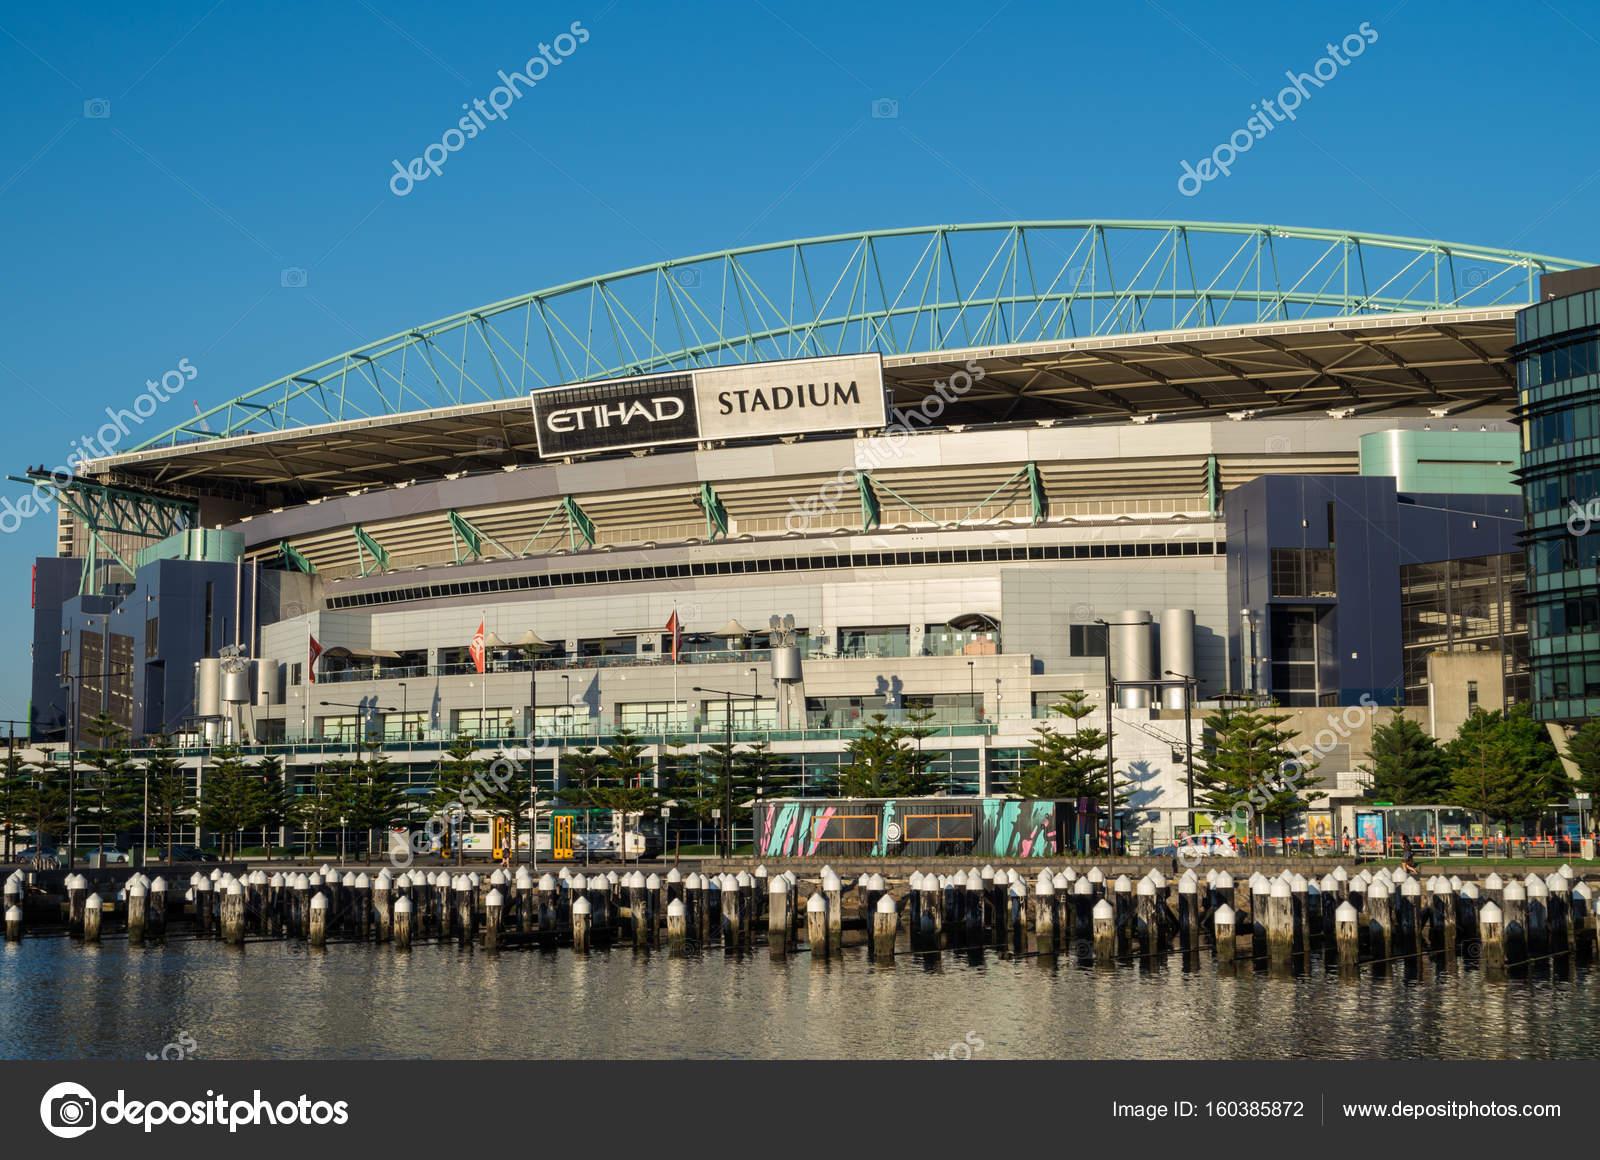 Etihad Stadium in Melbourne Docklands – Stock Editorial Photo ©  nilsversemann #160385872